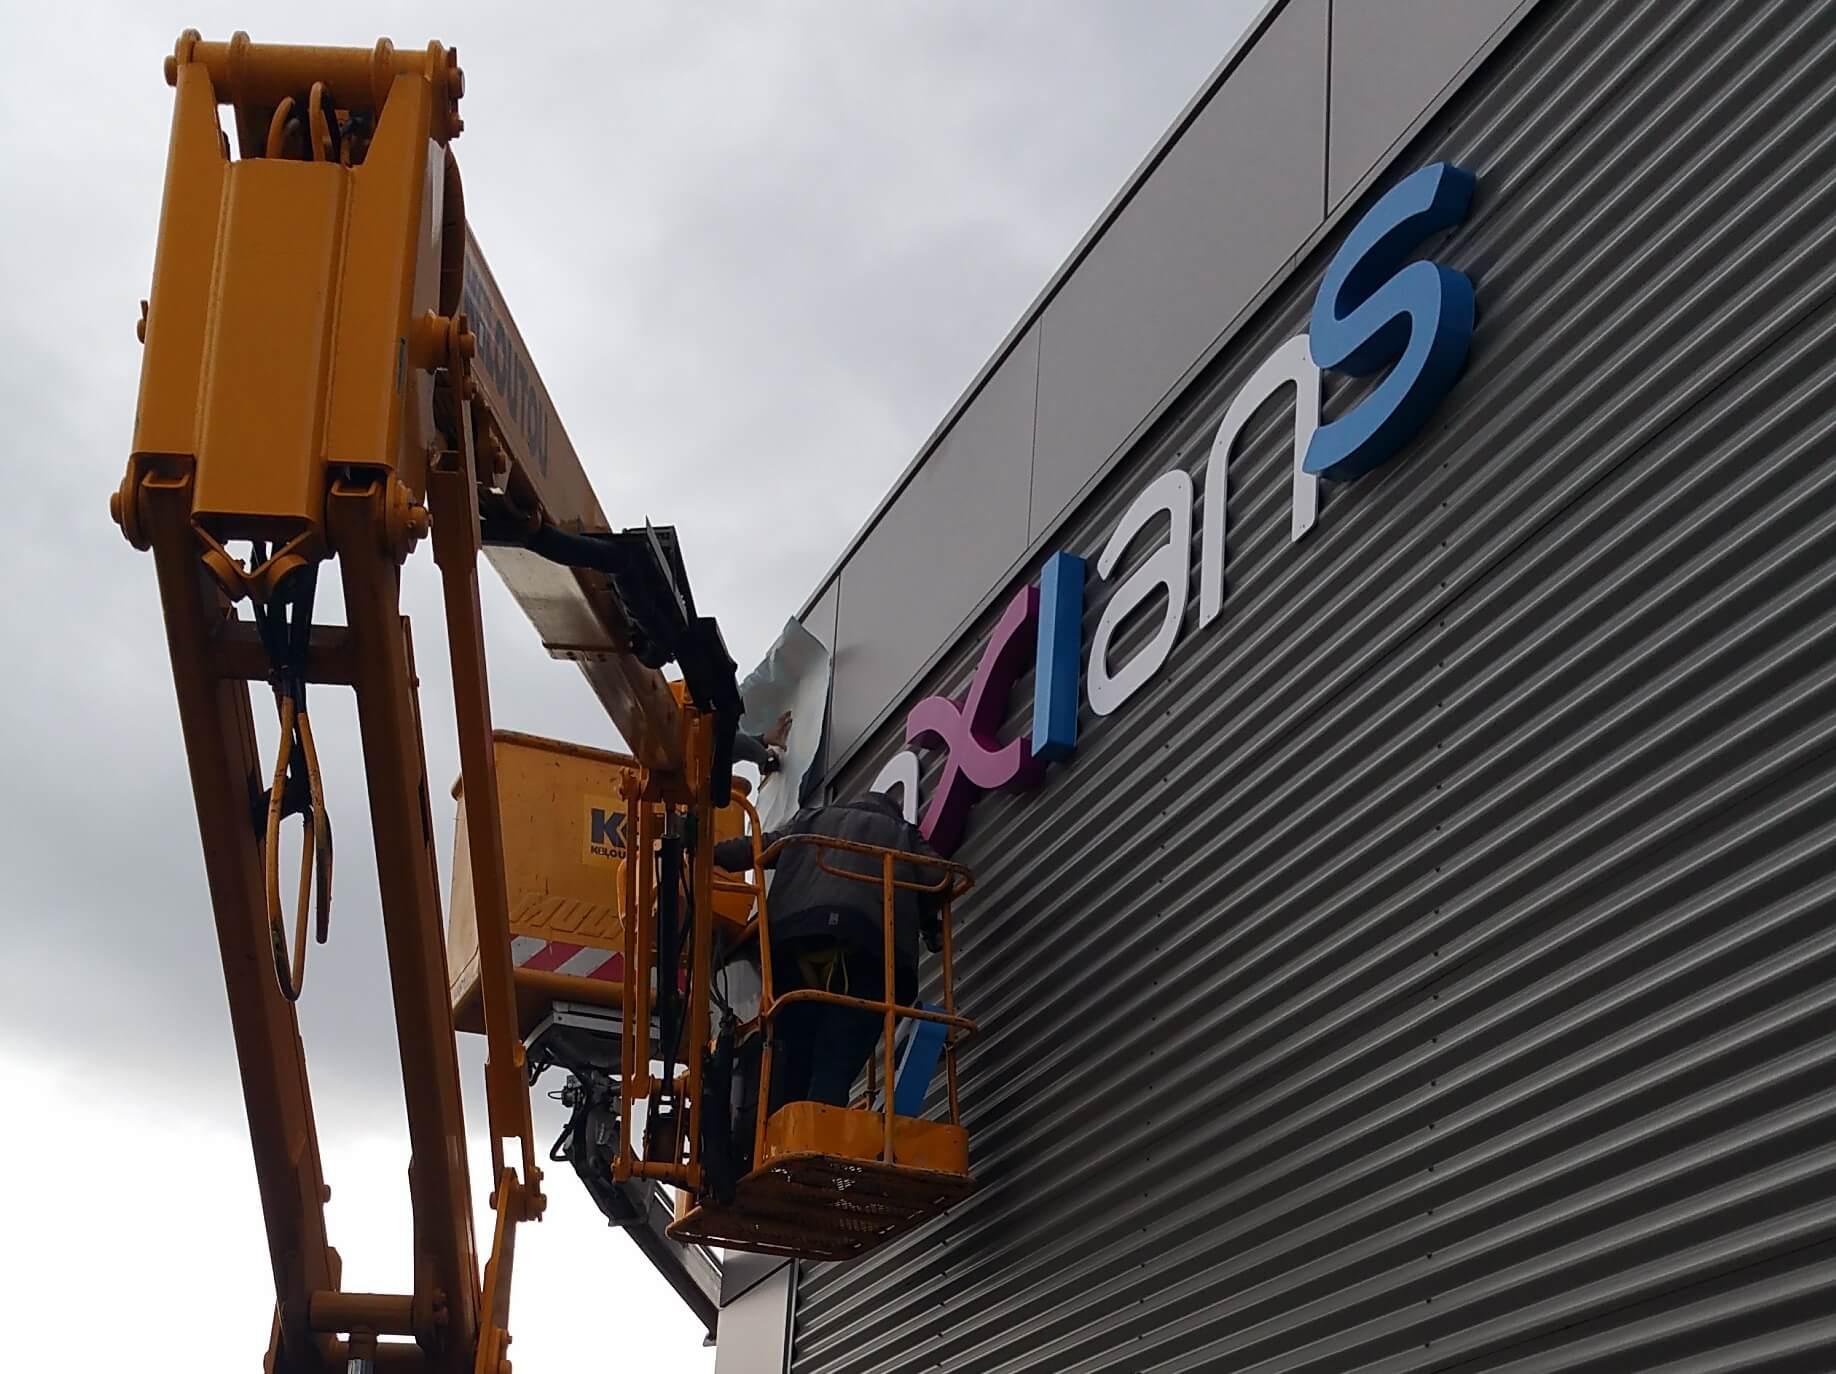 Installation enseigne lumineuse Axians Lyon -SES Lyon Grigny- Enseigniste